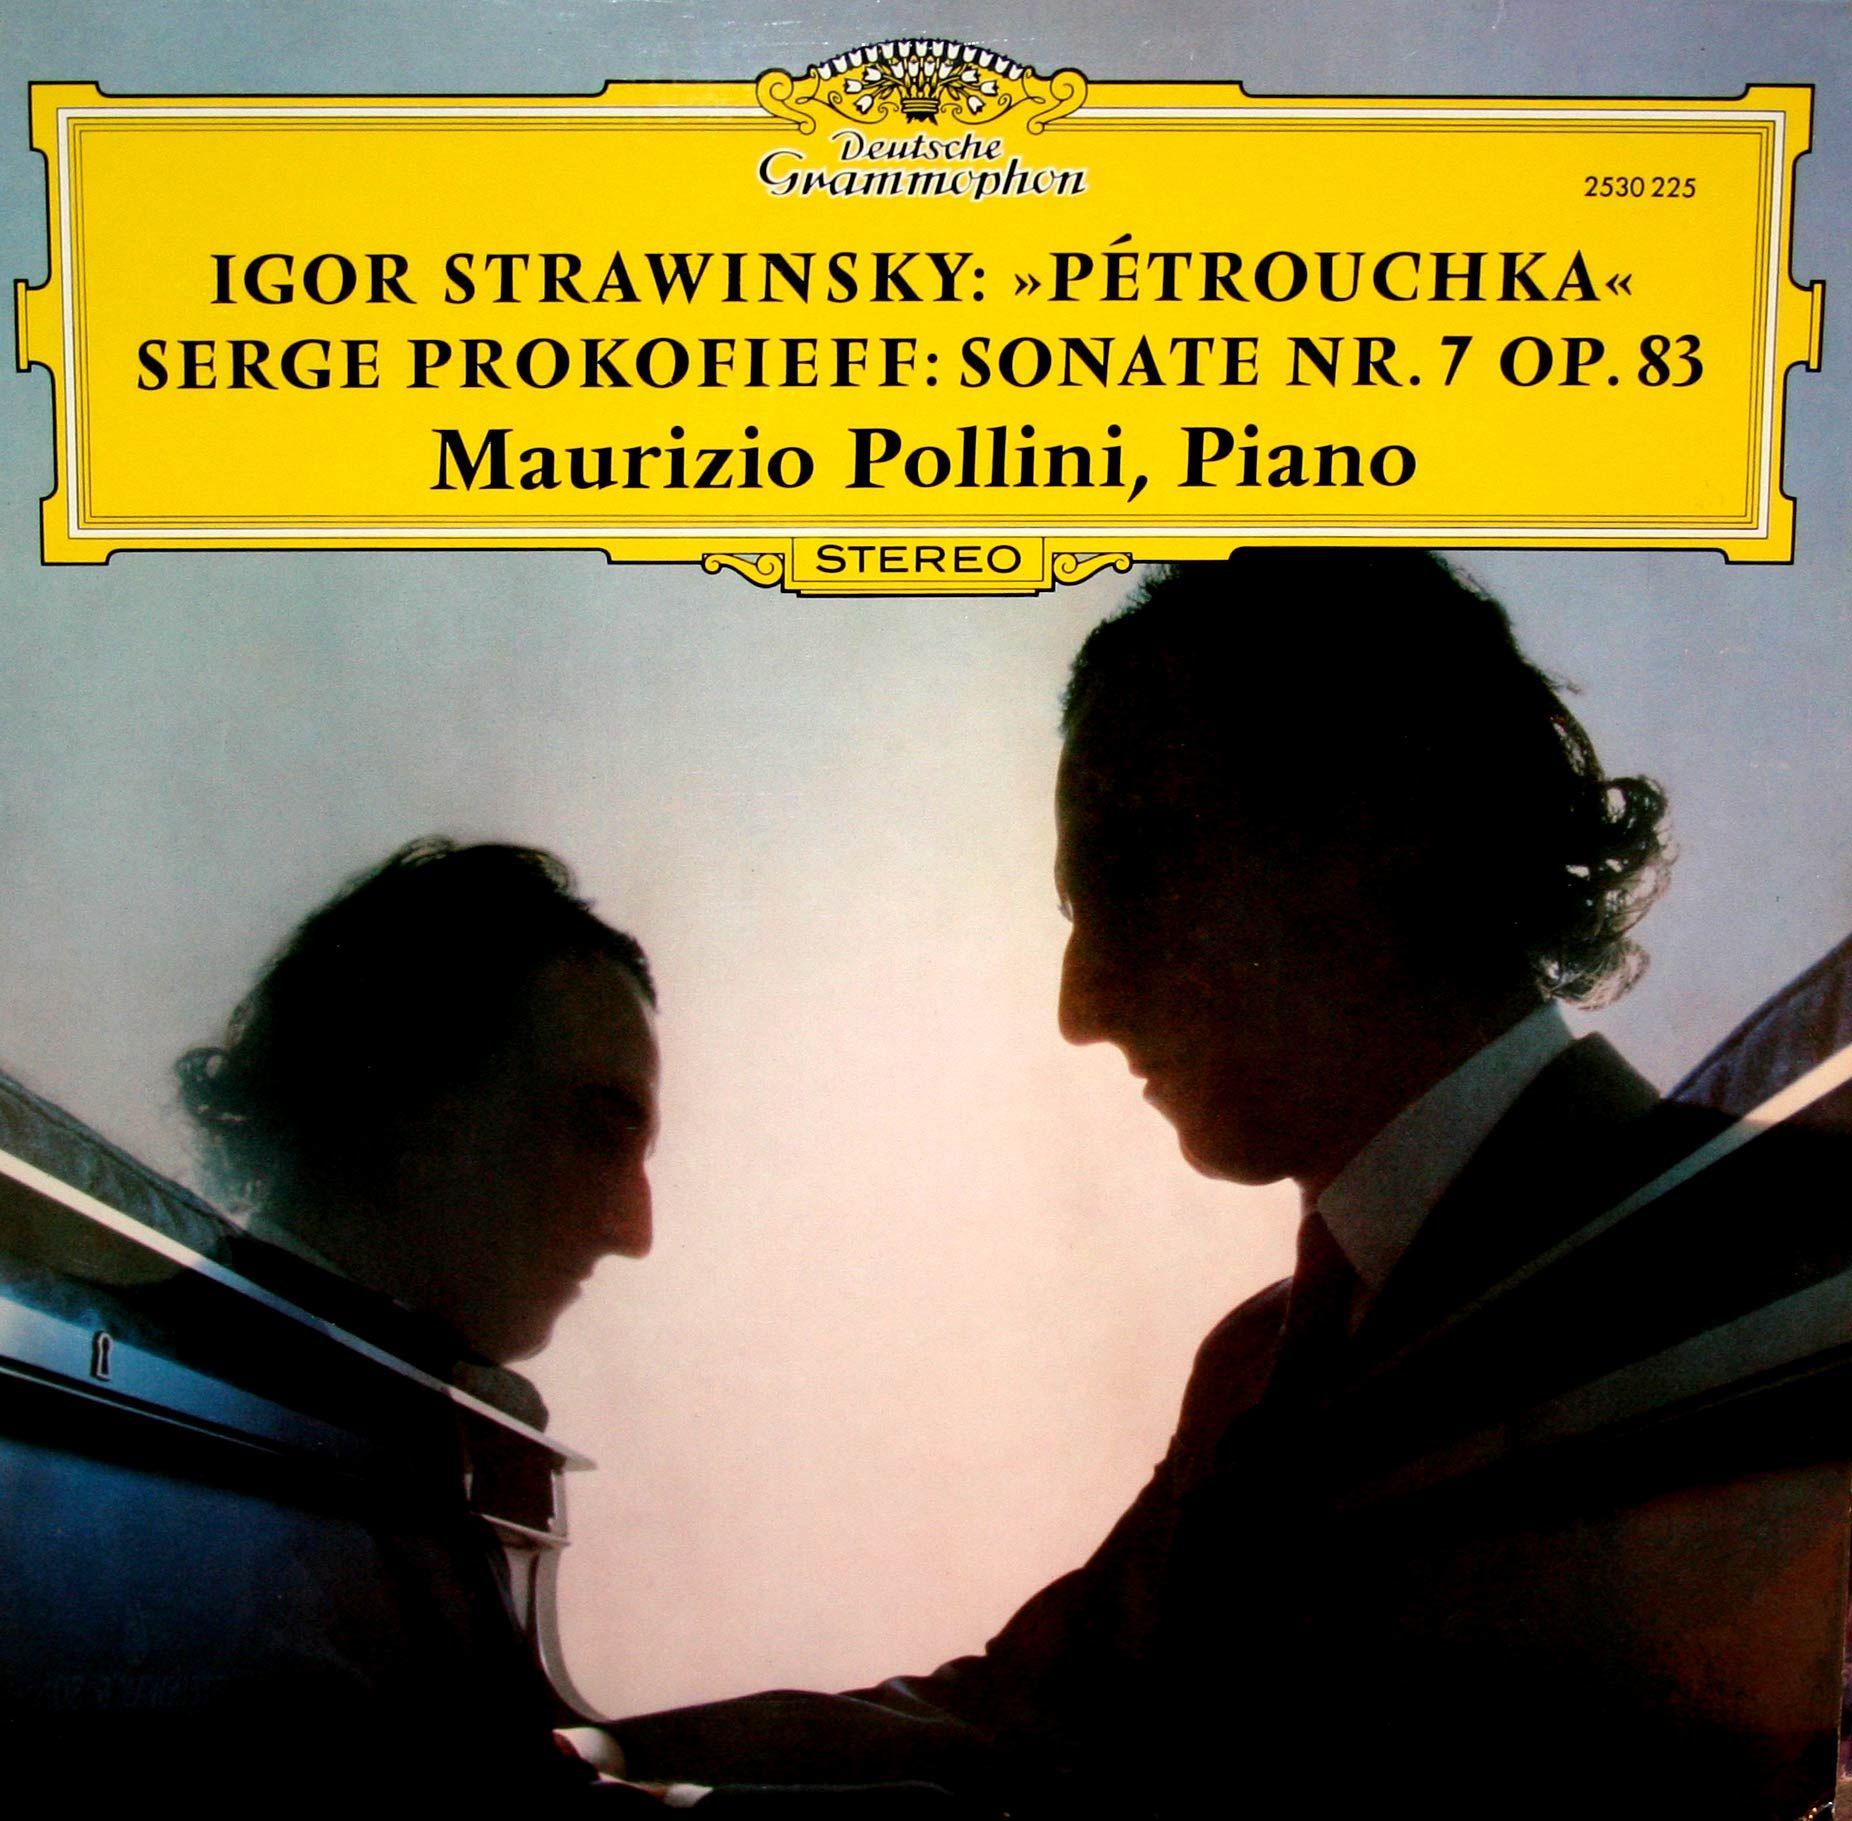 Strawinsky Prokofieff Wolfgang Schneiderhan Violinkonzert in D Violinsonate Nr 2 Op 94